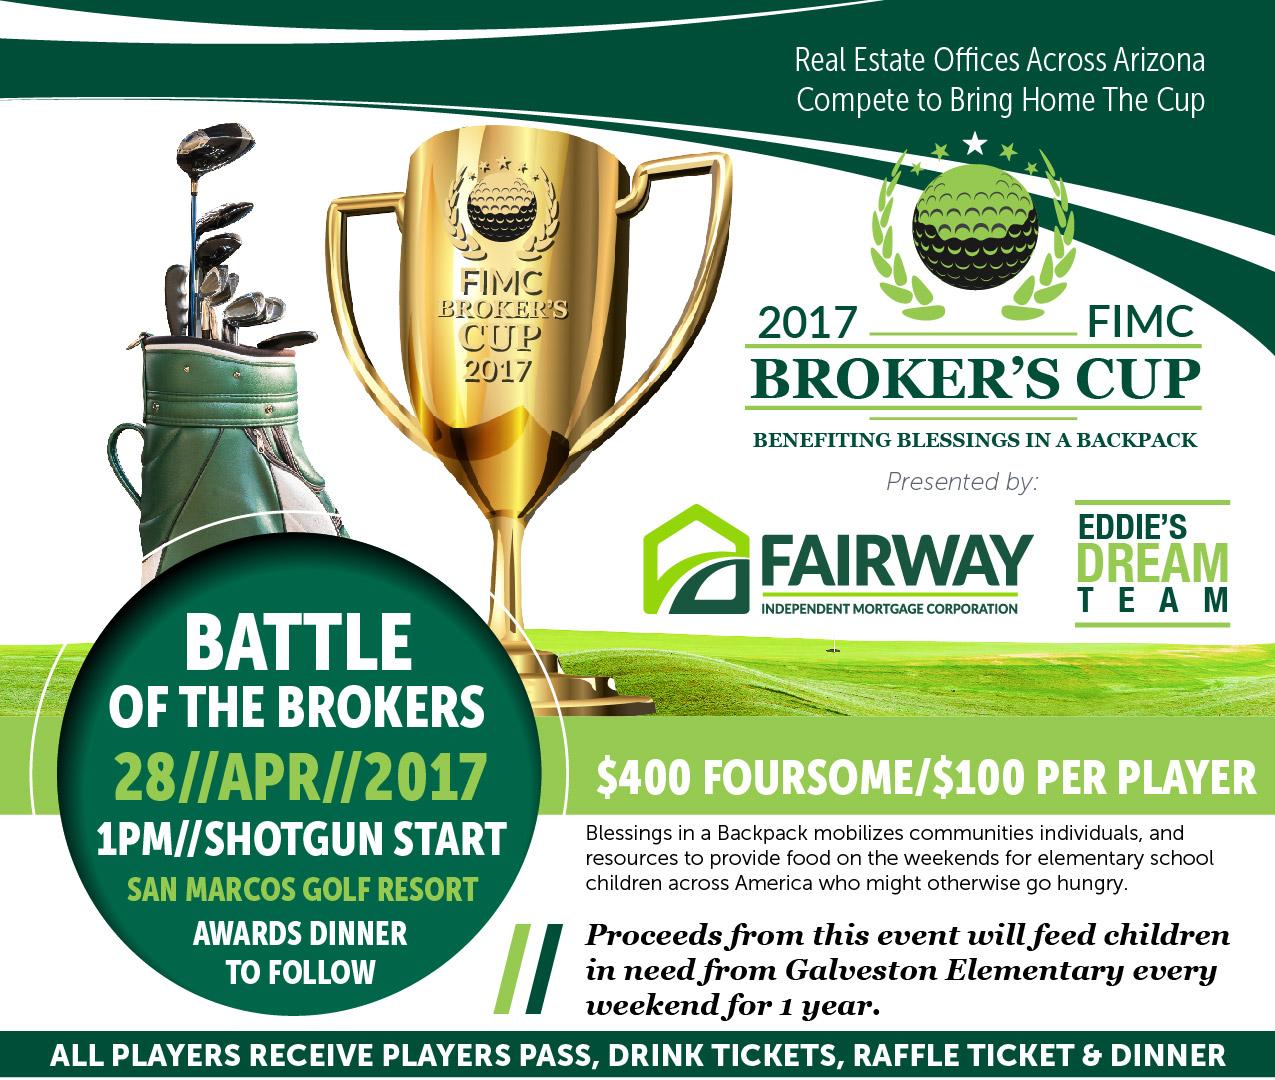 2017 FIMC Broker's Cup